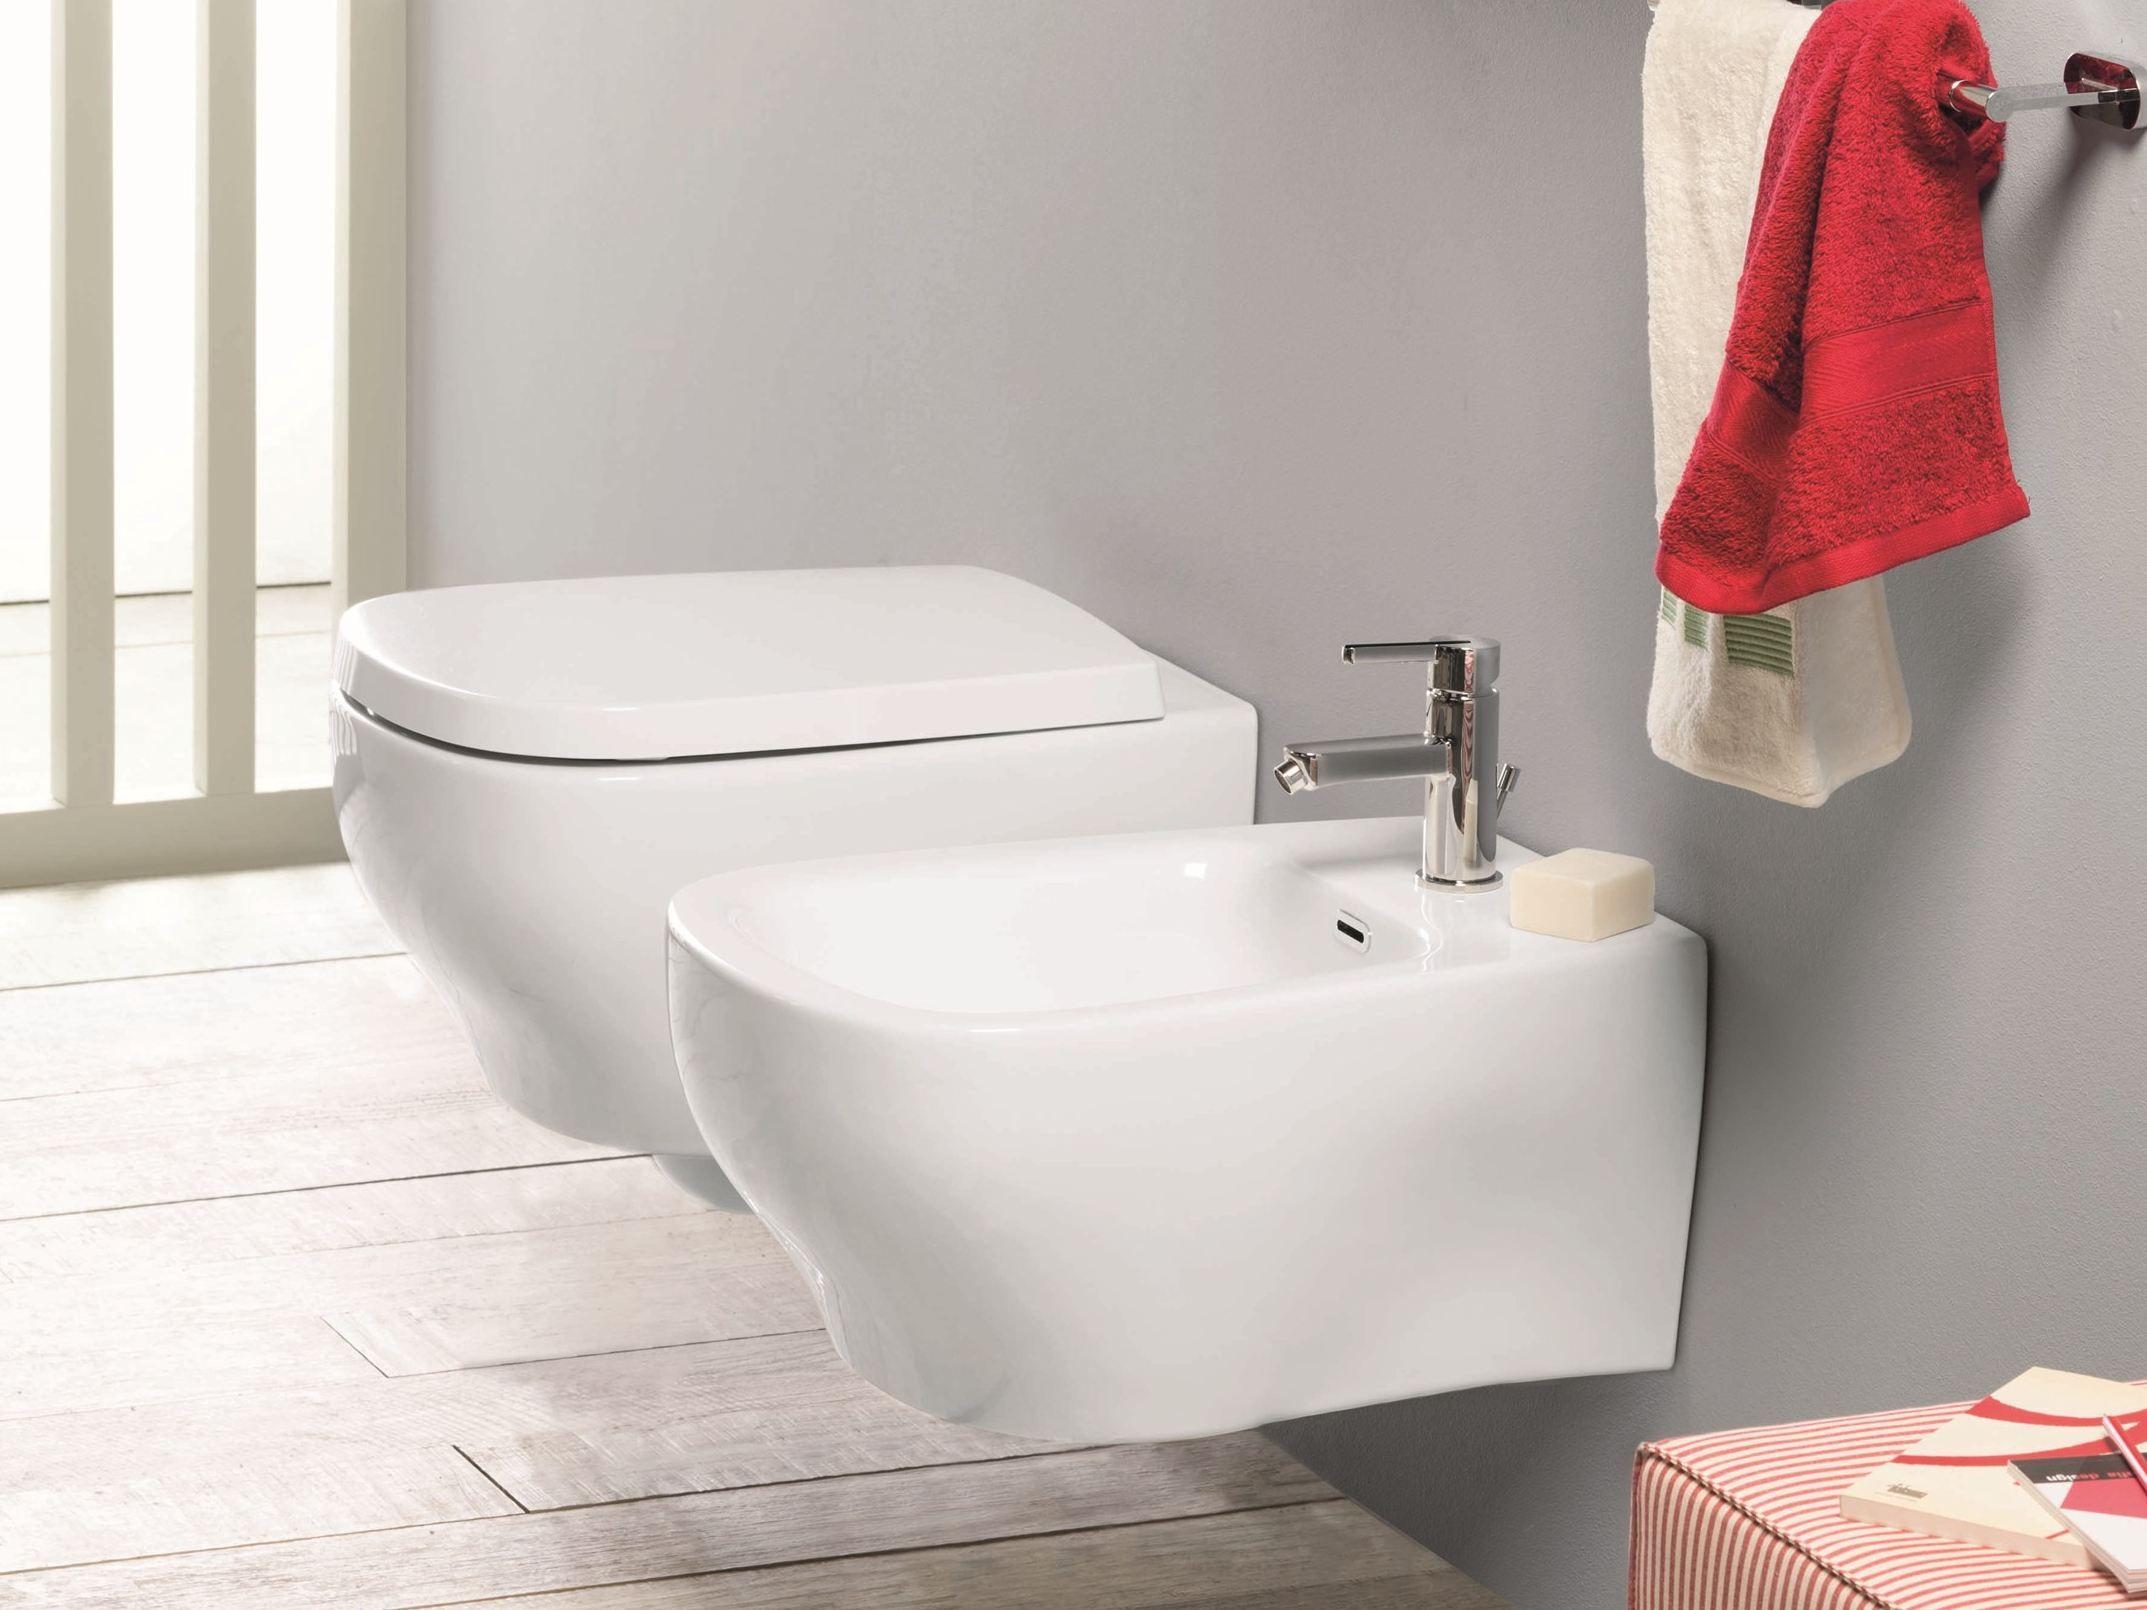 fluida | wc sospeso collezione fluida by newform - Ceramica Bagno Fluida Di Newform